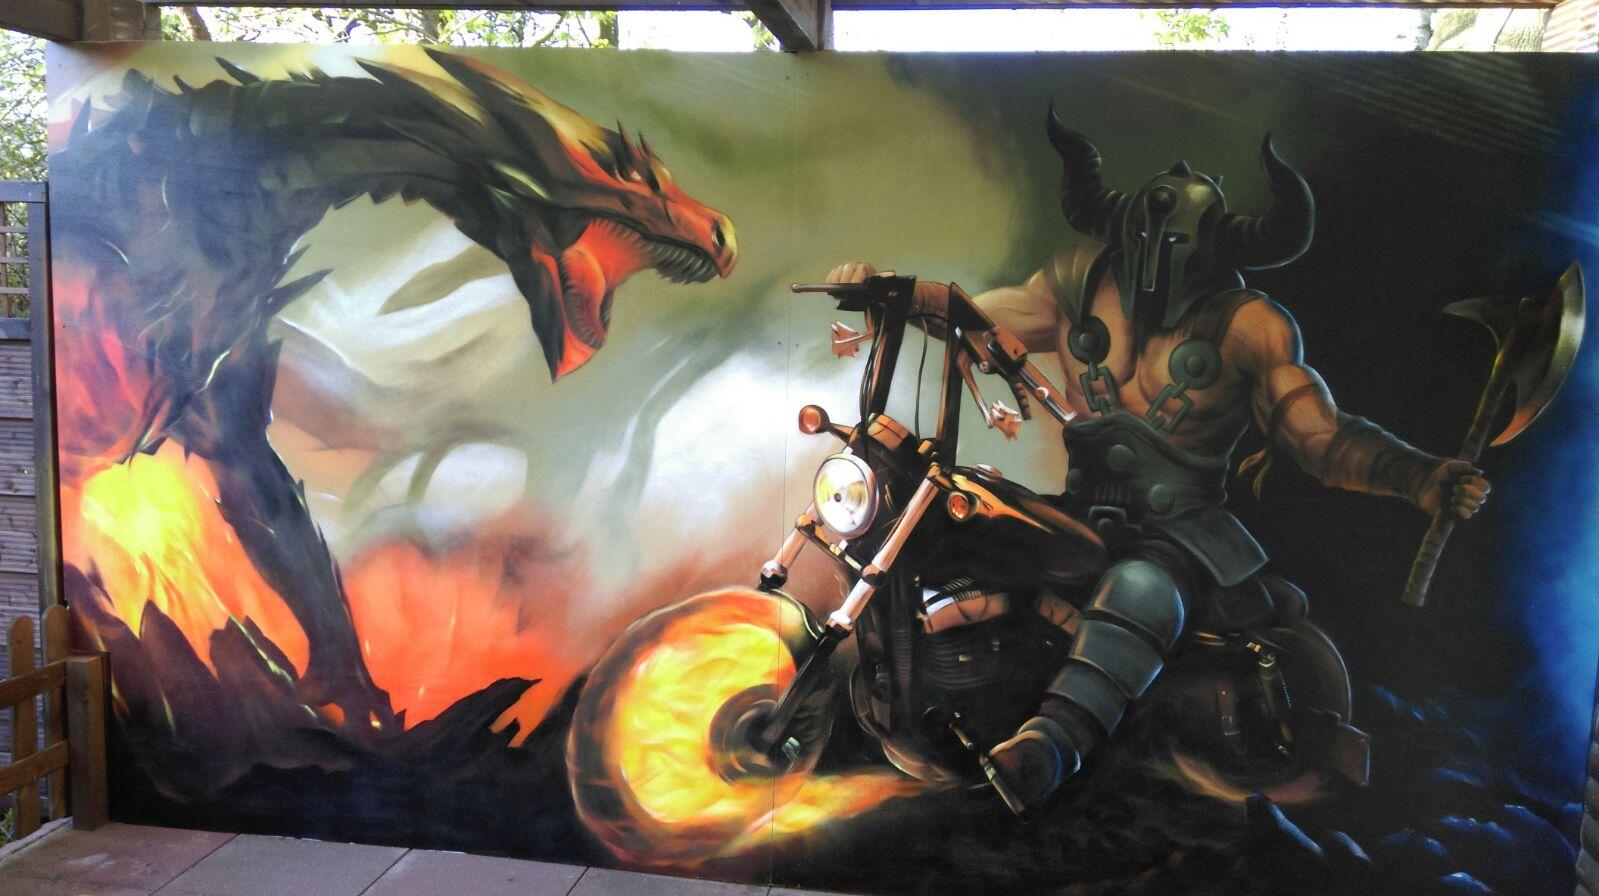 Harley davidson graffiti terrasse